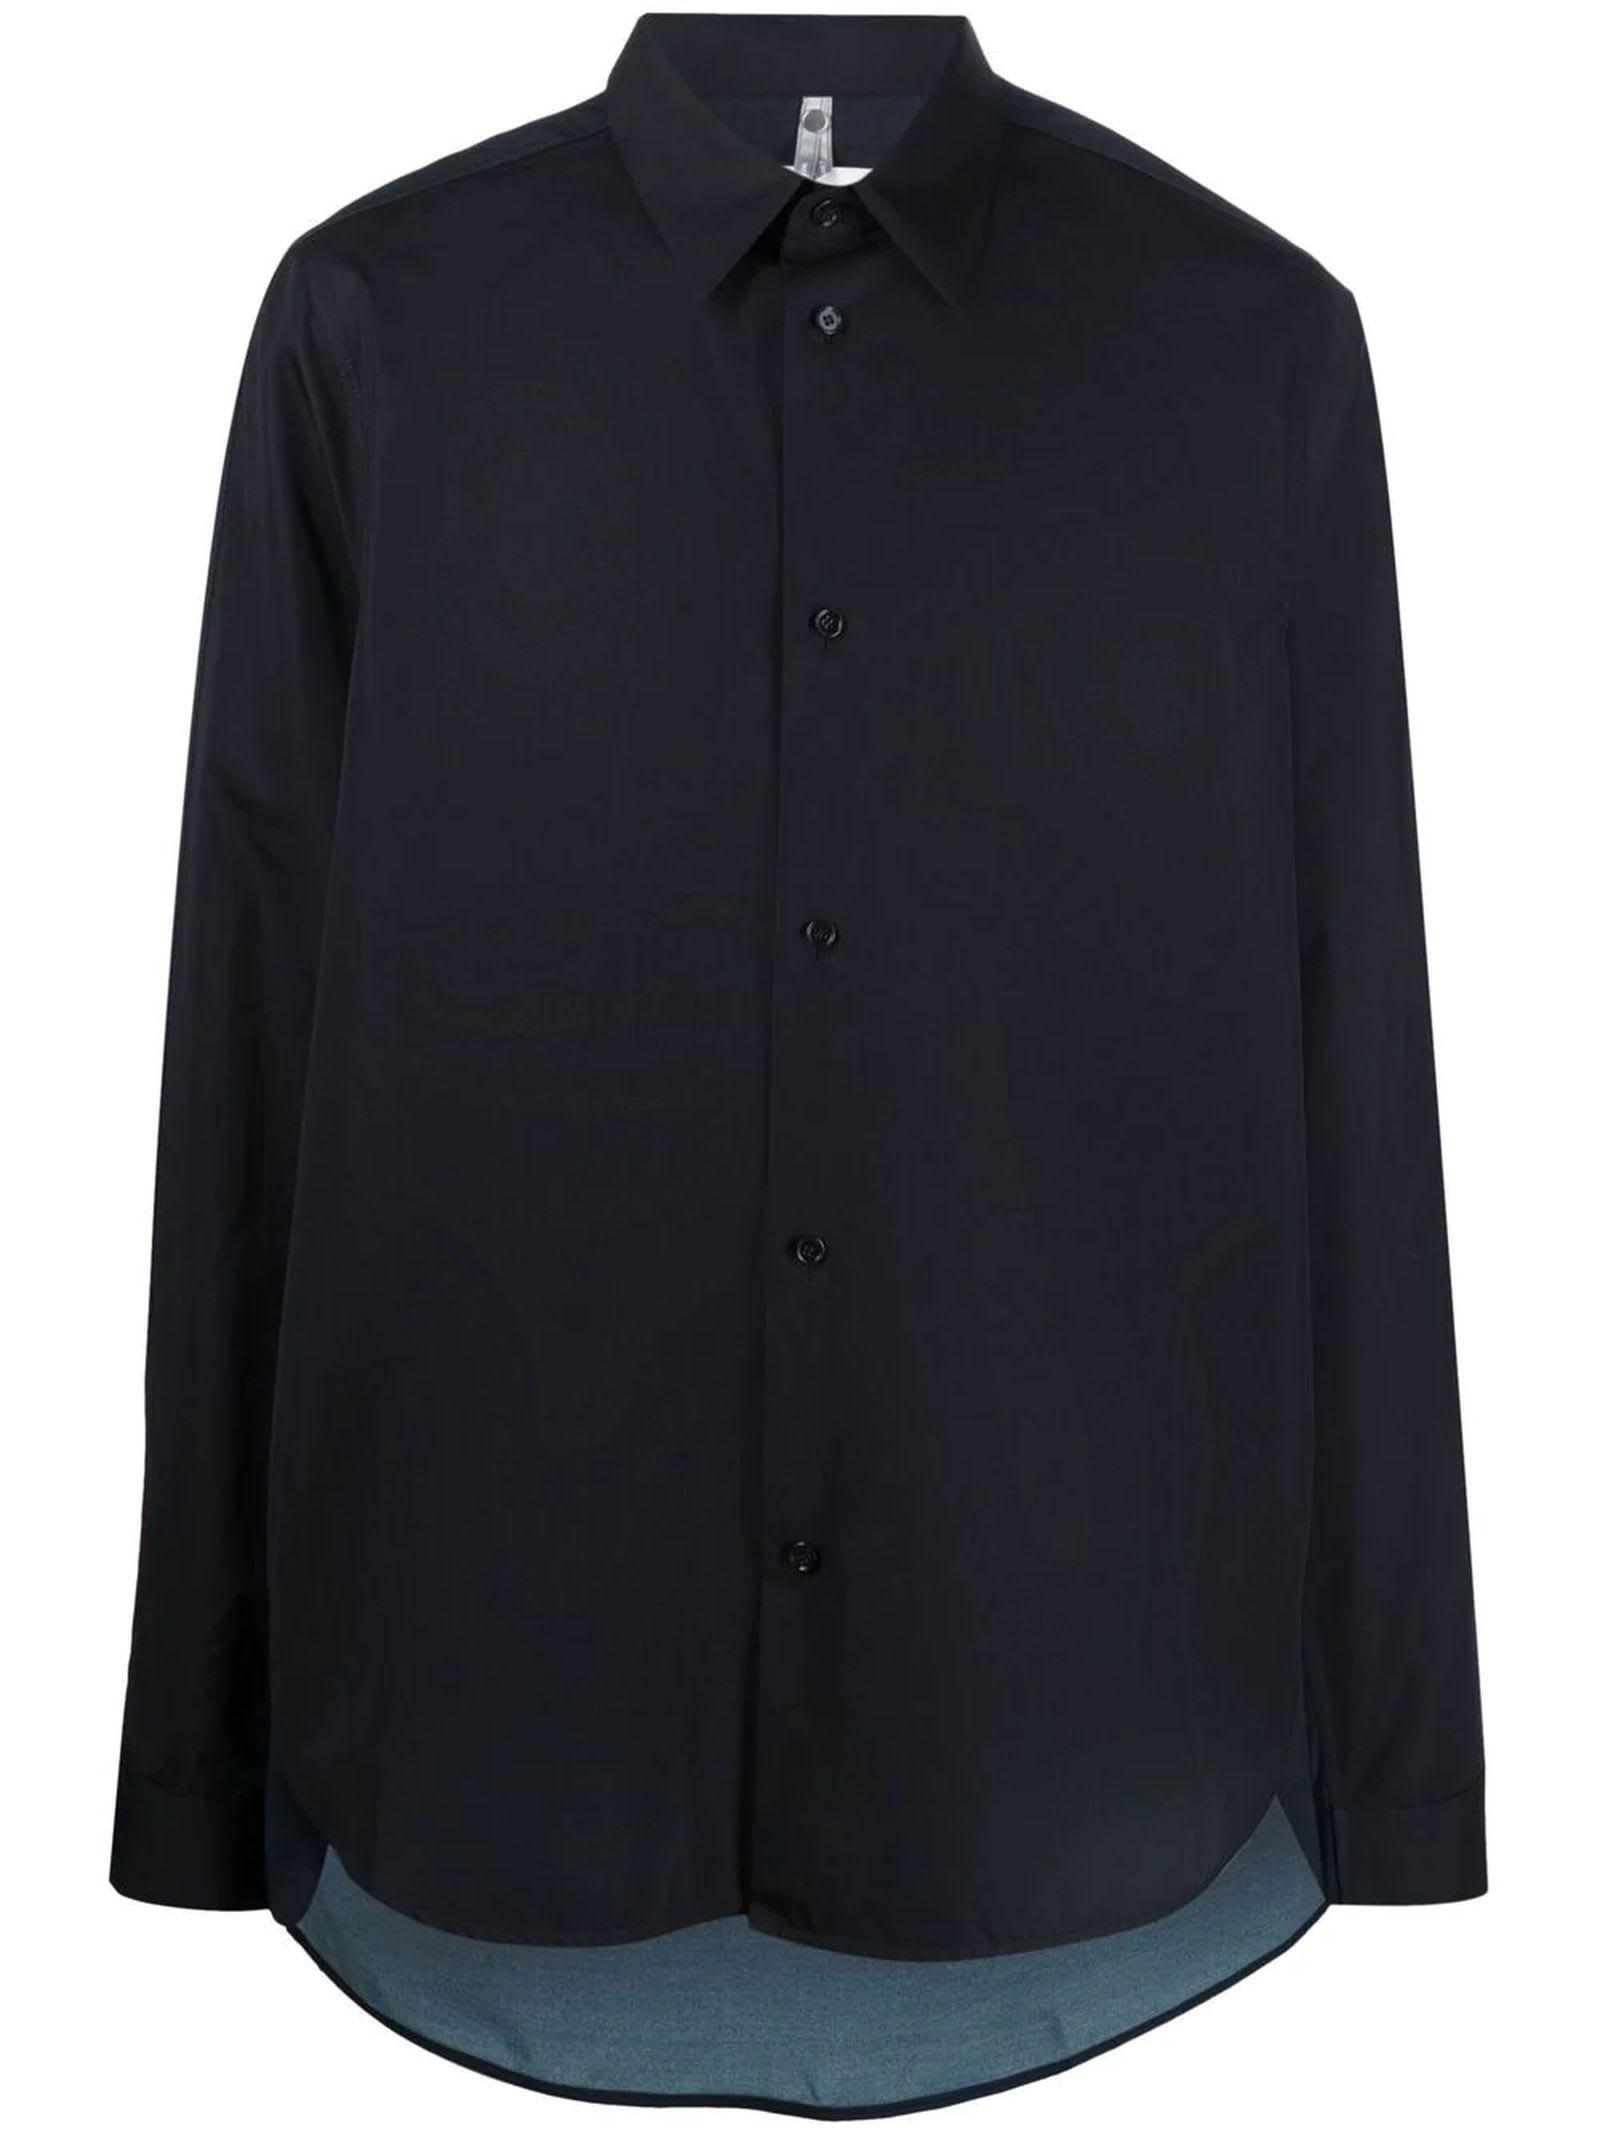 Oamc Shirts BLACK COTTON SHIRT